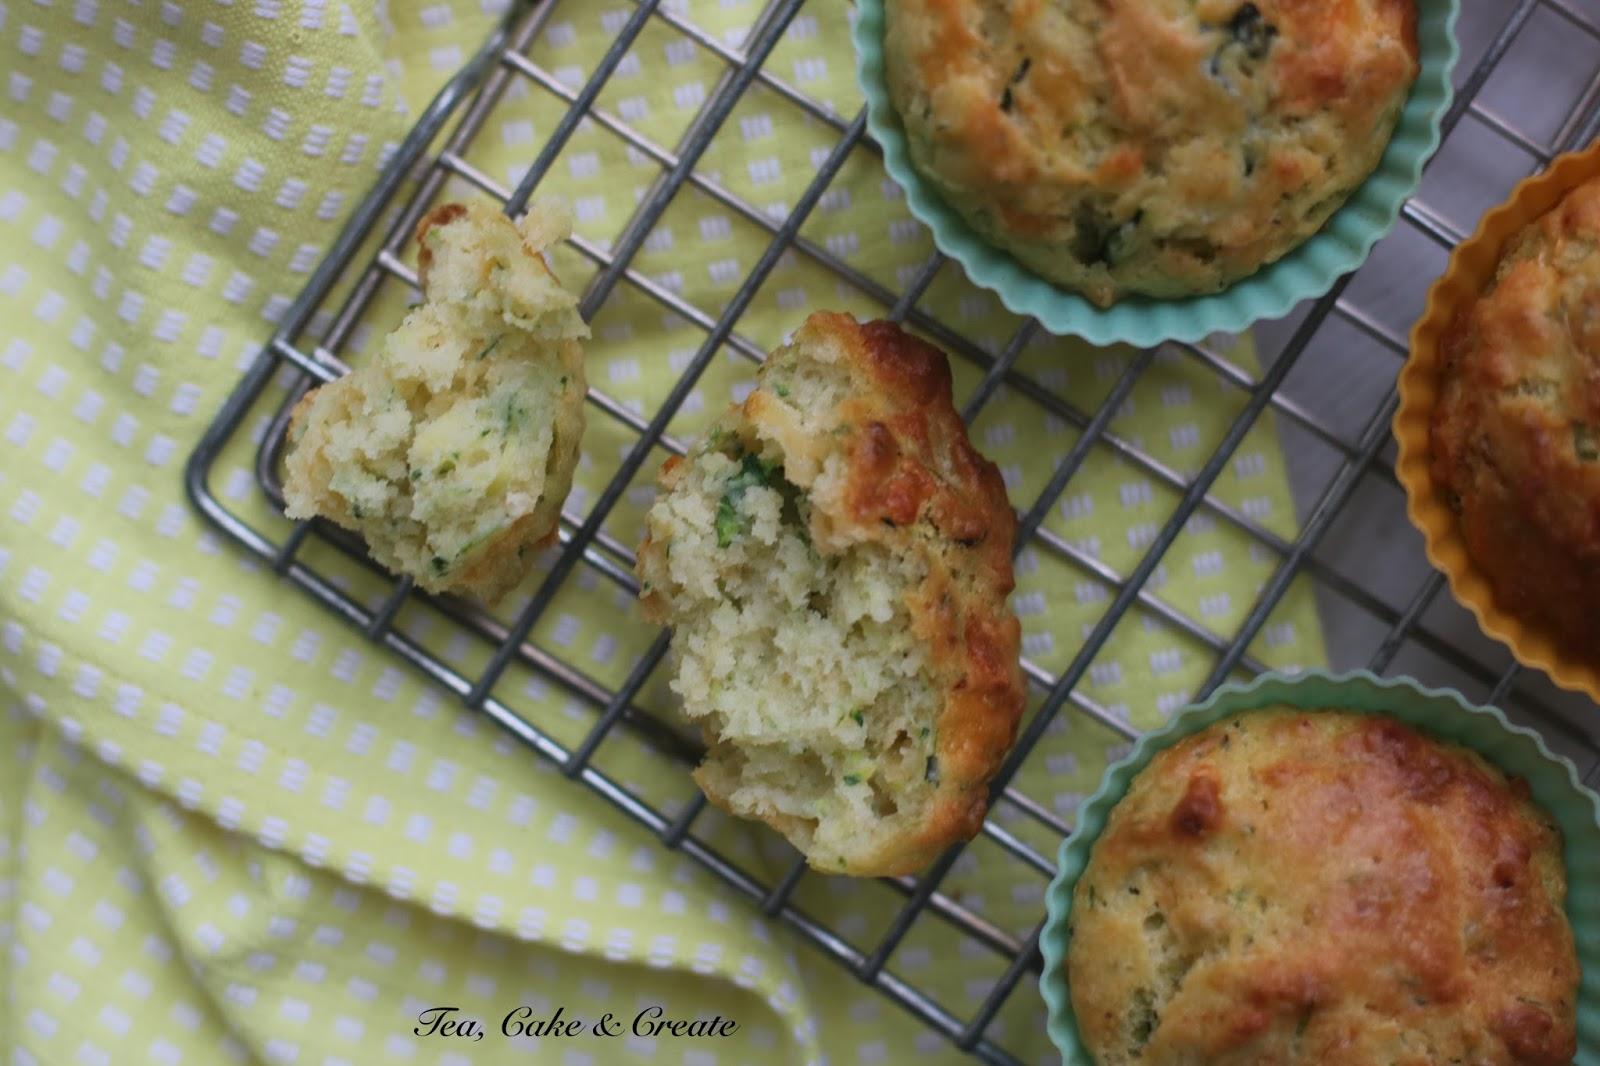 Adding Zucchini To Cake Mix